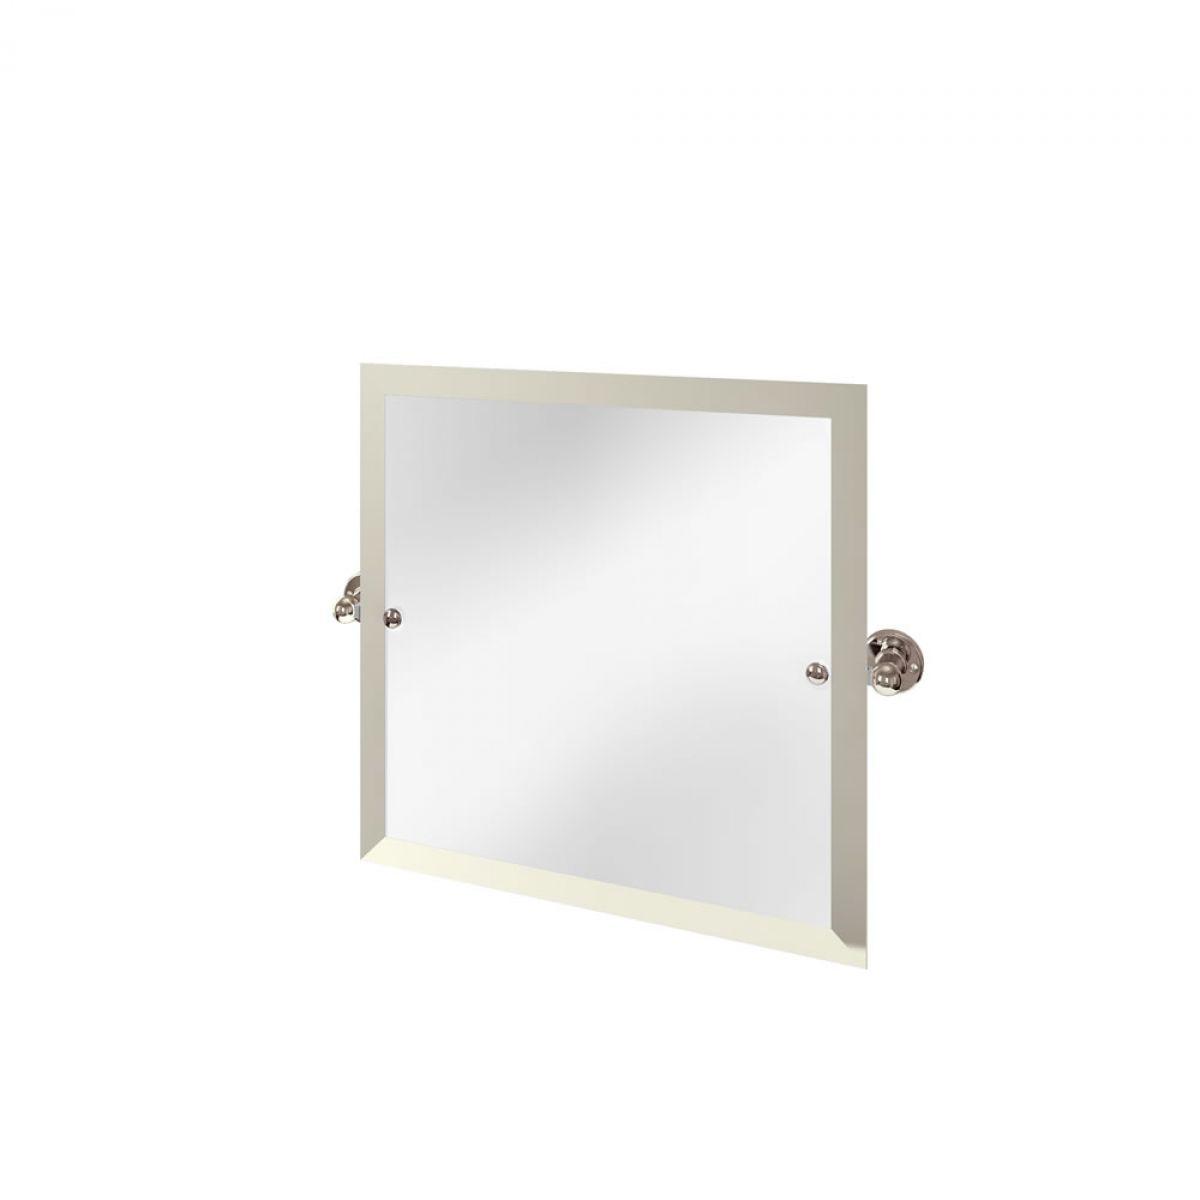 Arcade square swivel tilting mirror uk bathrooms - Wall mounted tilting bathroom mirrors ...